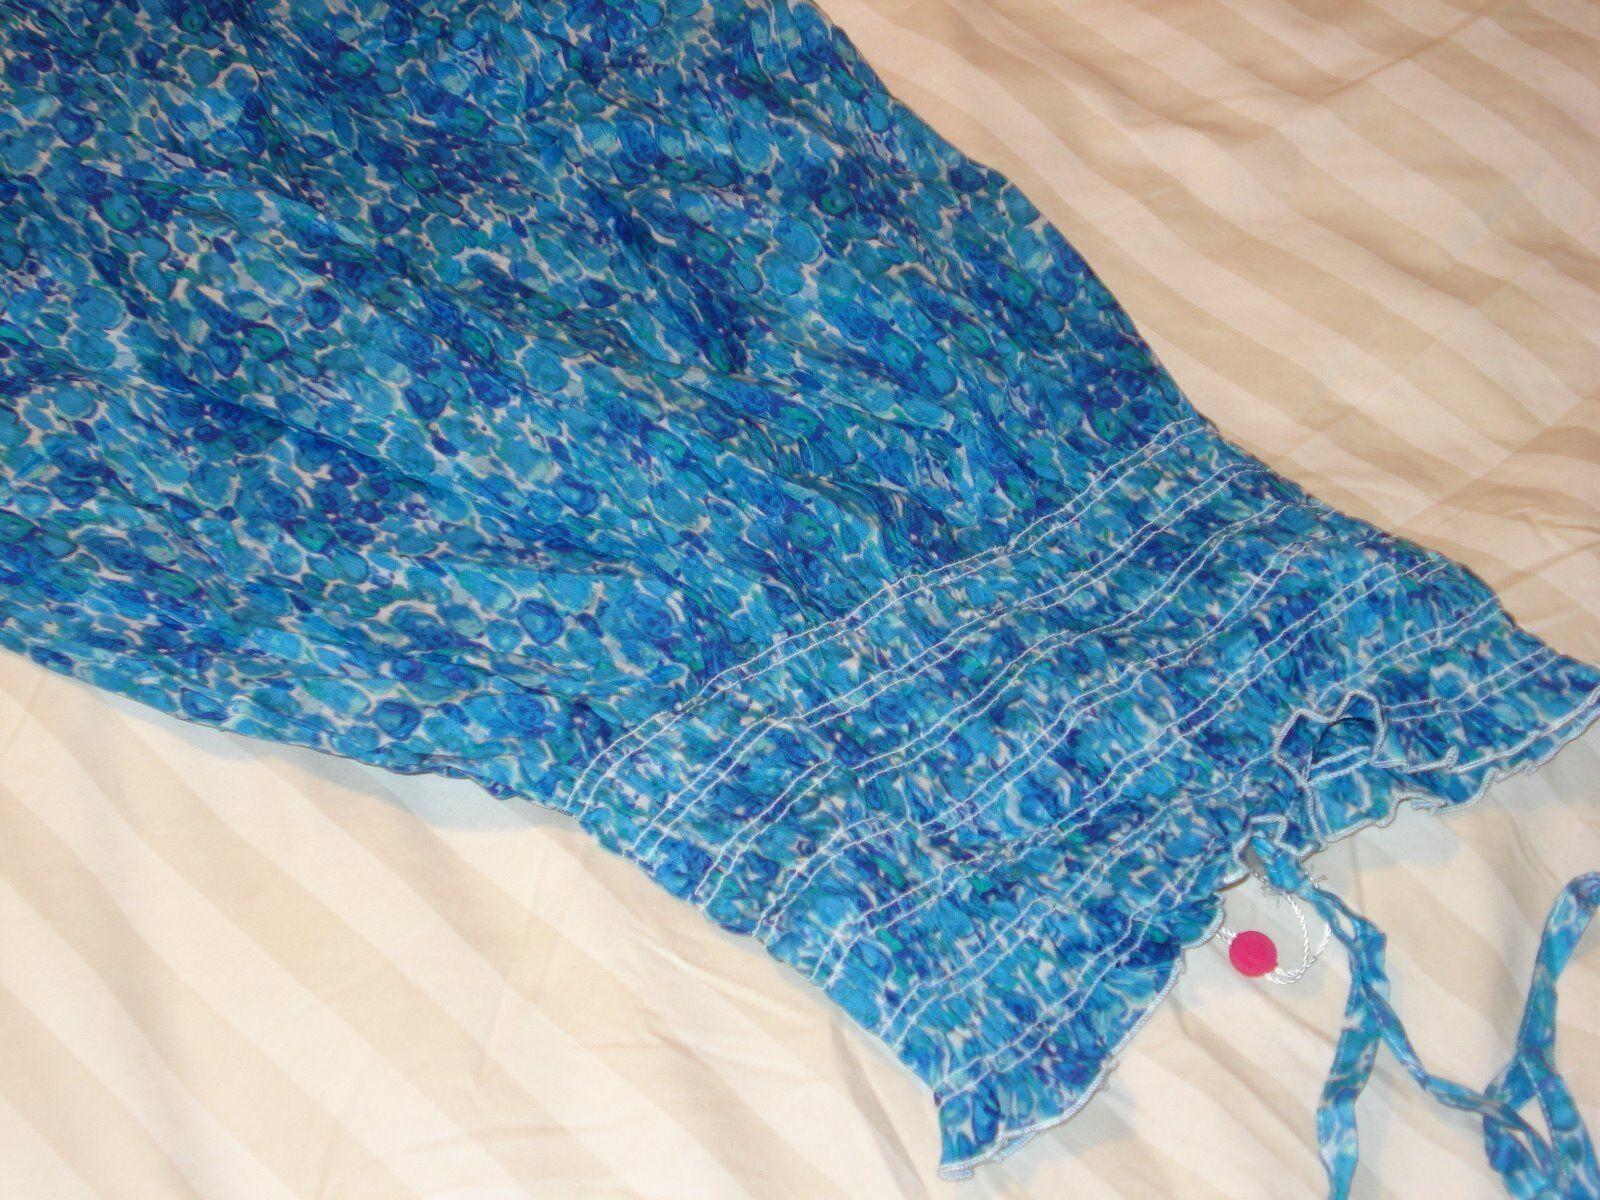 ECHO DESIGN COTTON NWT blueE PRINTED SUN DRESS BEACH COVERUP